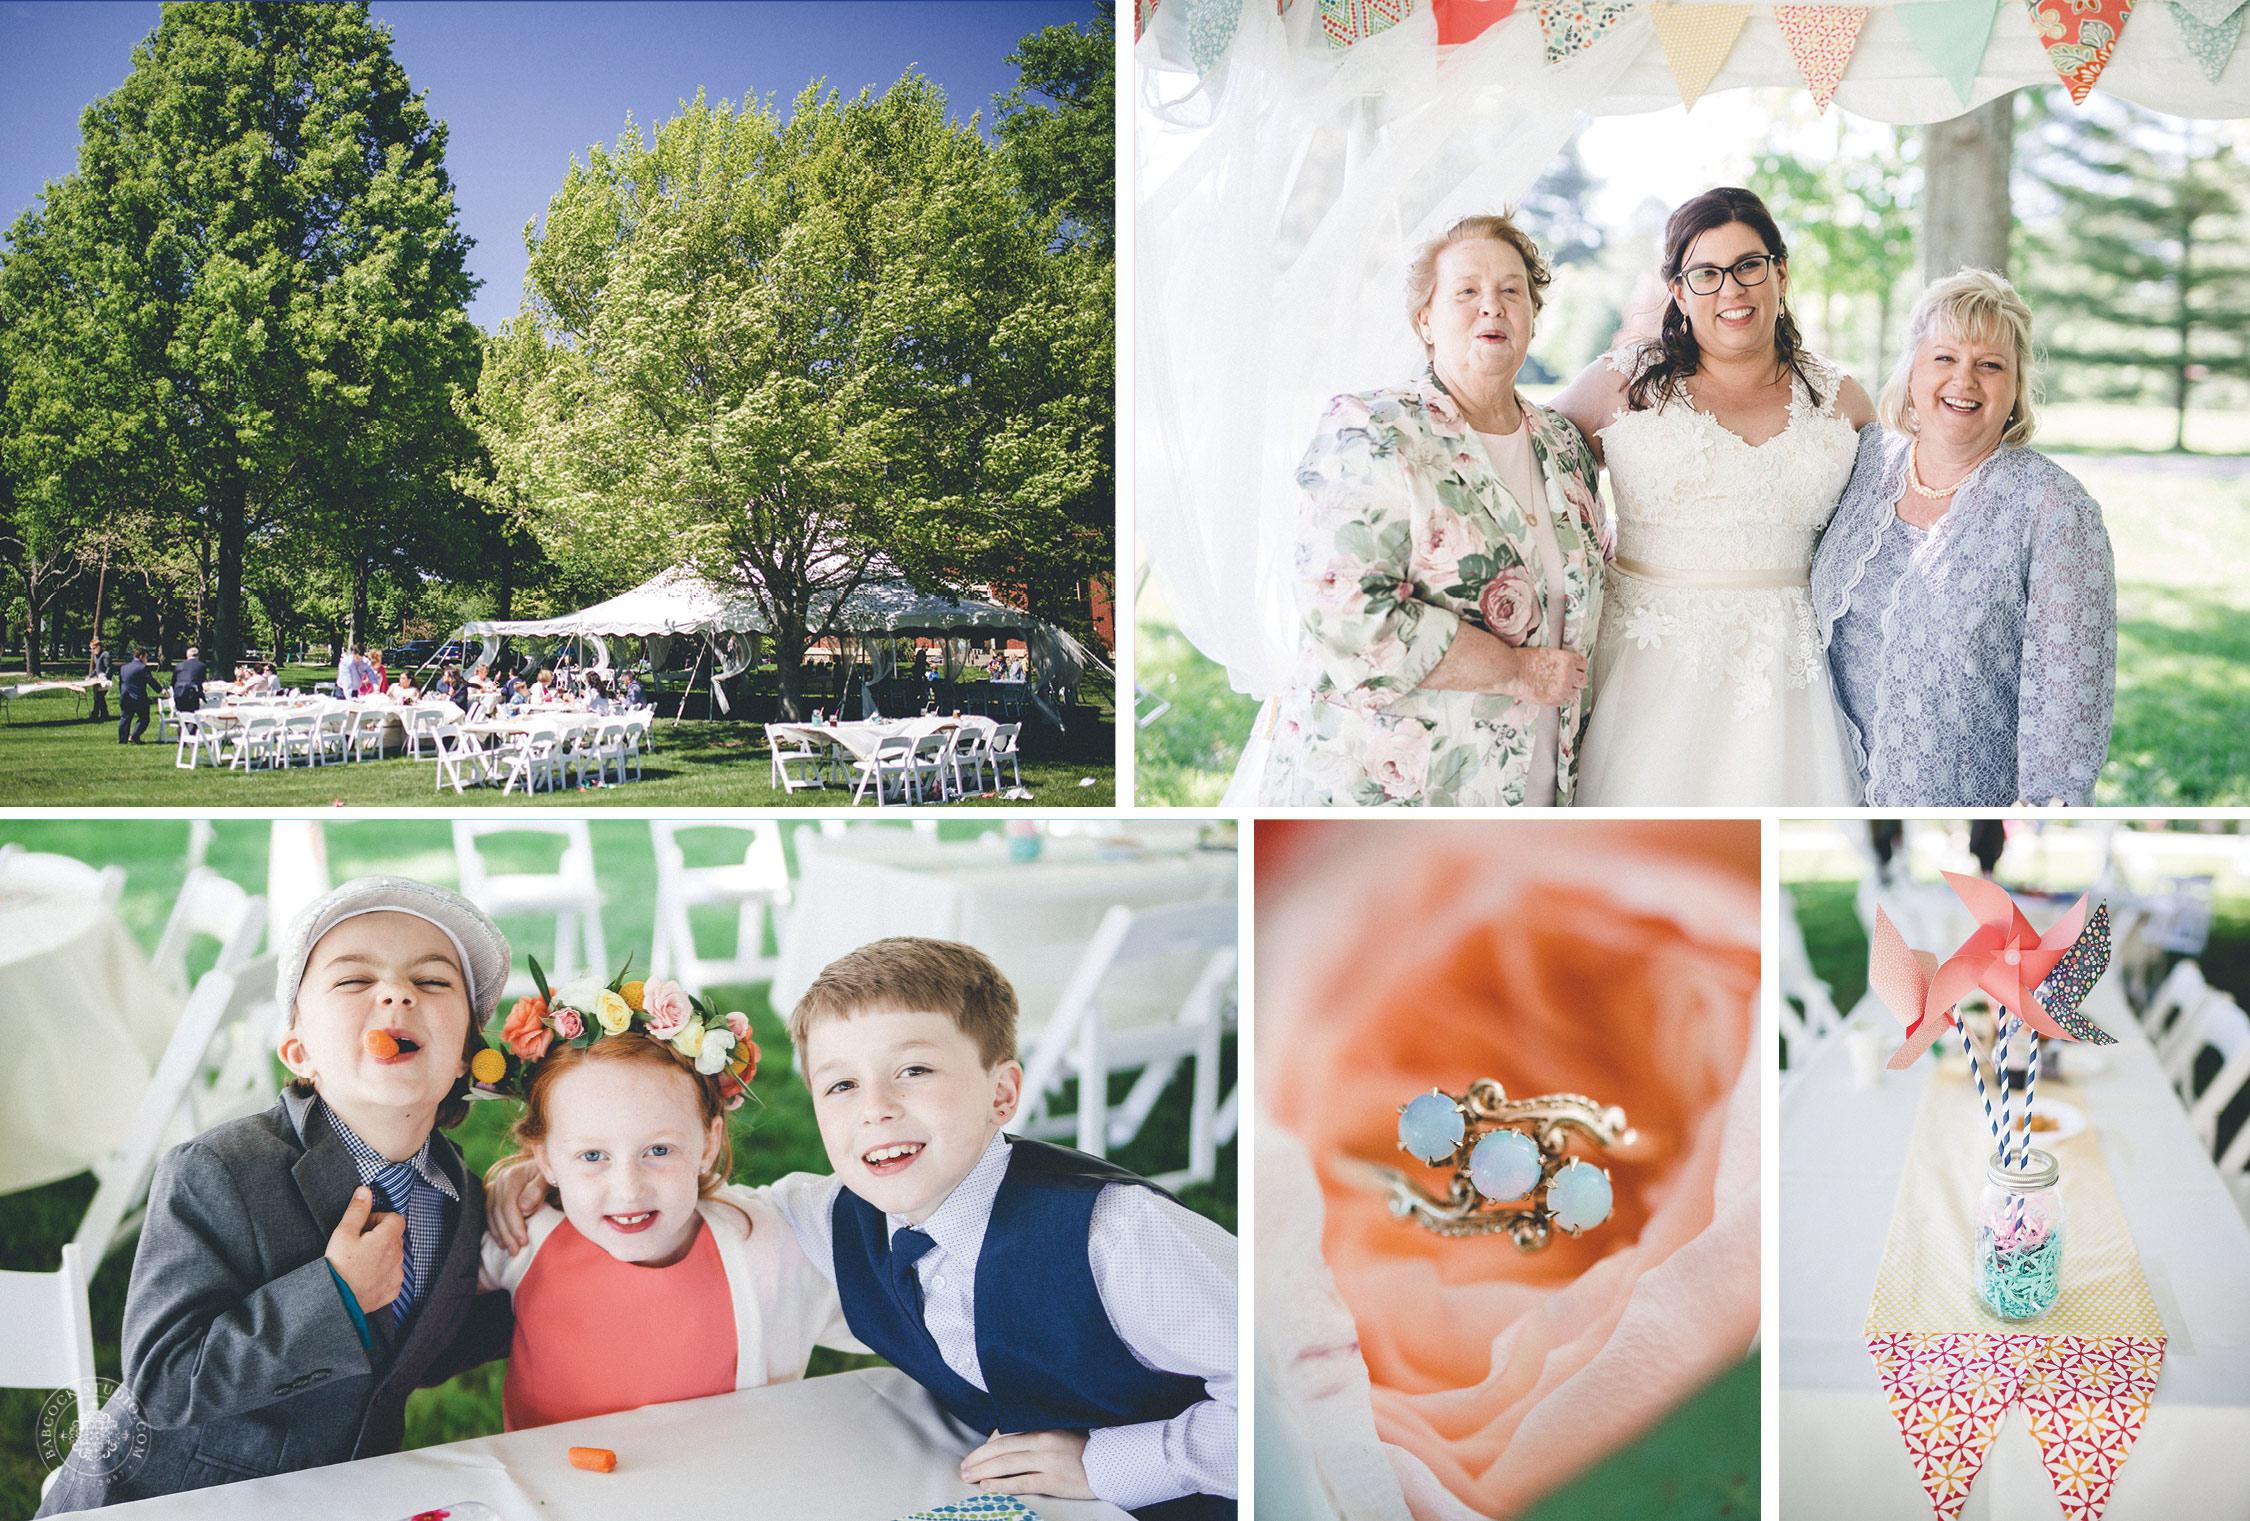 nicole-brendarn-school-house-wedding-photographer-dayton-ohio-20.jpg